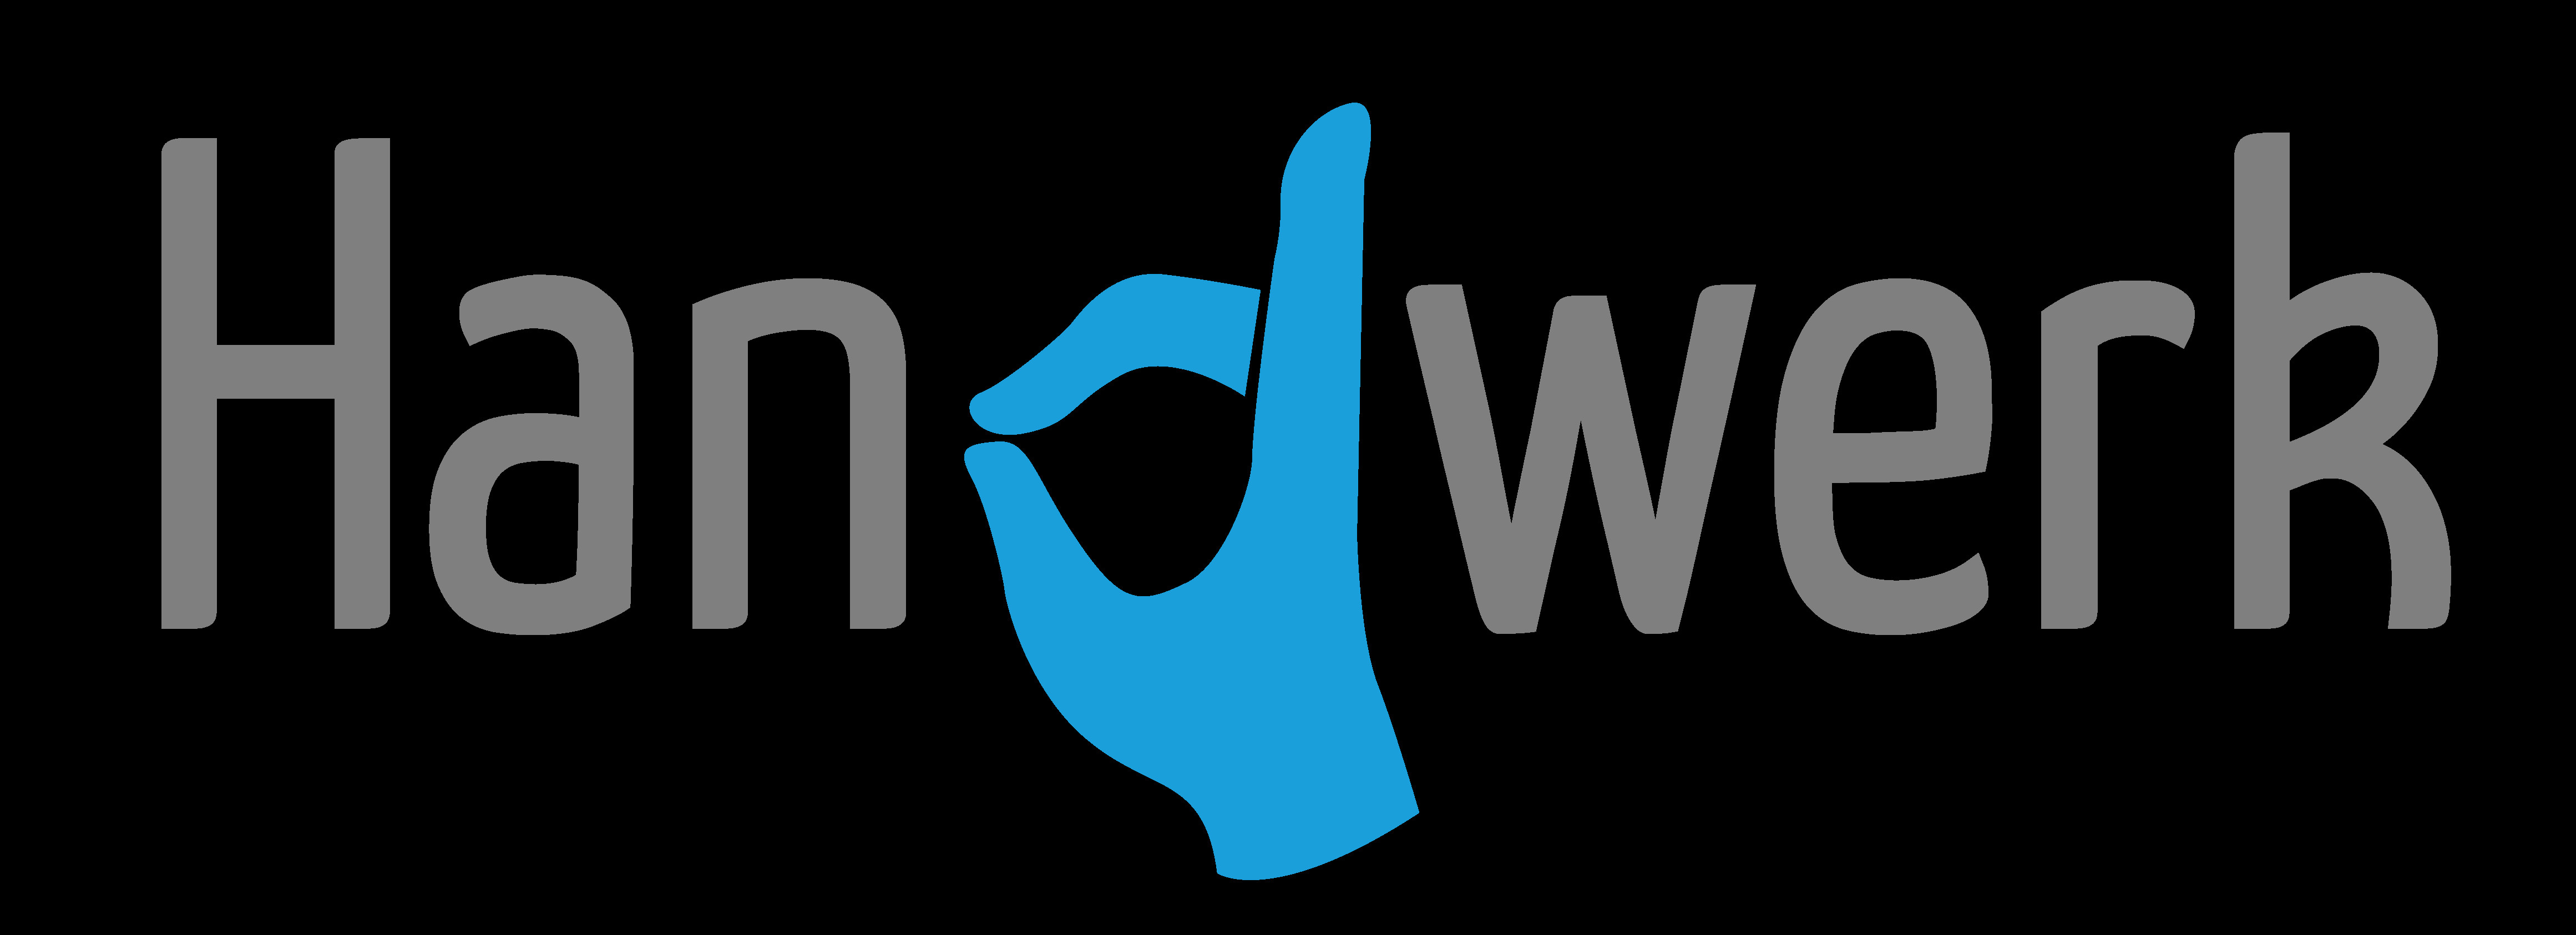 Handwerk Logo  Referenties over Reclamebureau Studio evi RECLAMEBUREAU